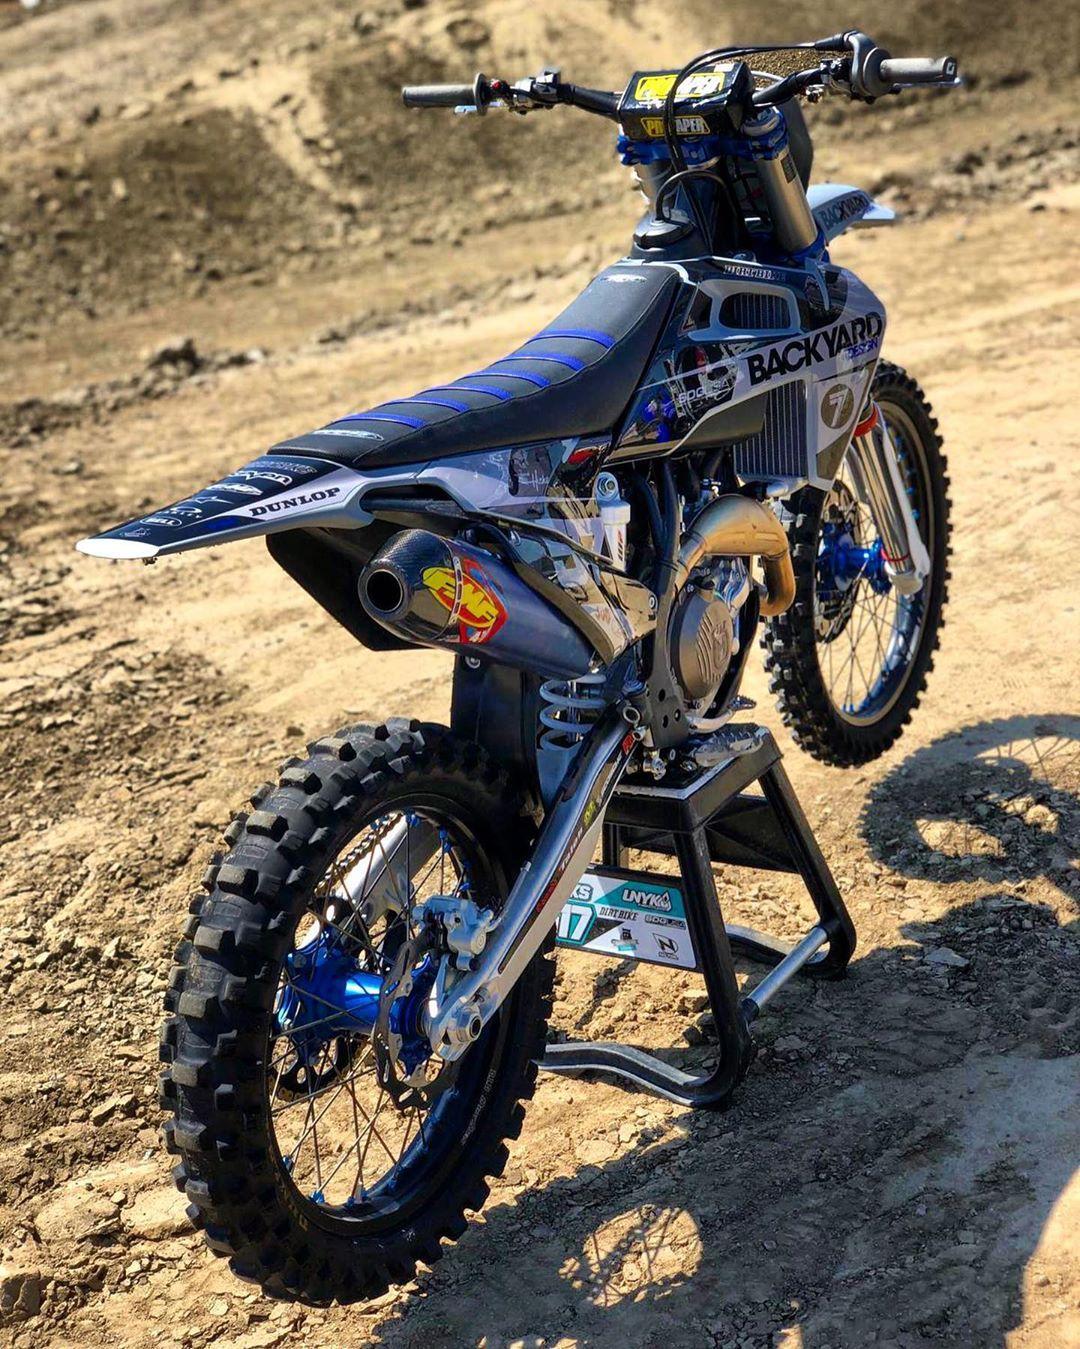 Different Colors For Jaredhicks517 S Husqvarna Custom Graphic Kit In Grey Blue Bydteam Motocross Bikes Custom Dirt Bike Dirt Bike Room